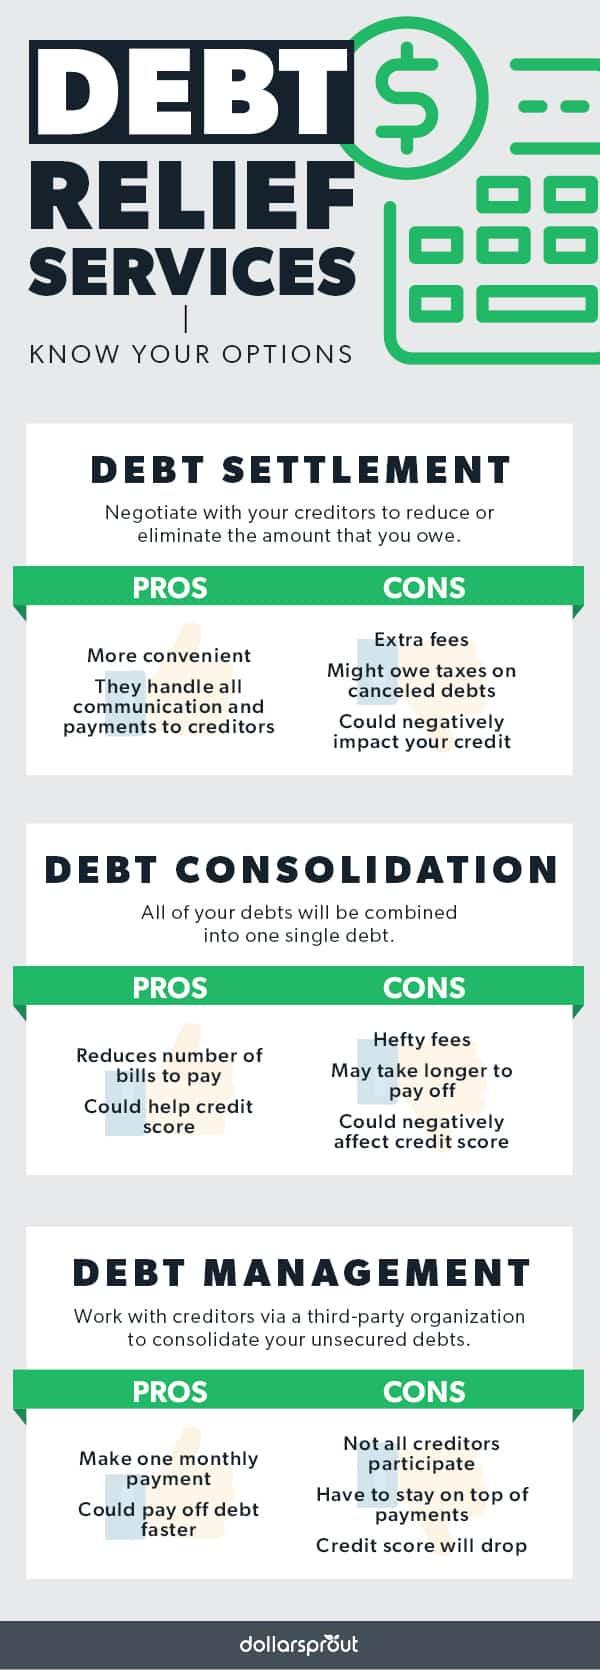 debt relief services infographic